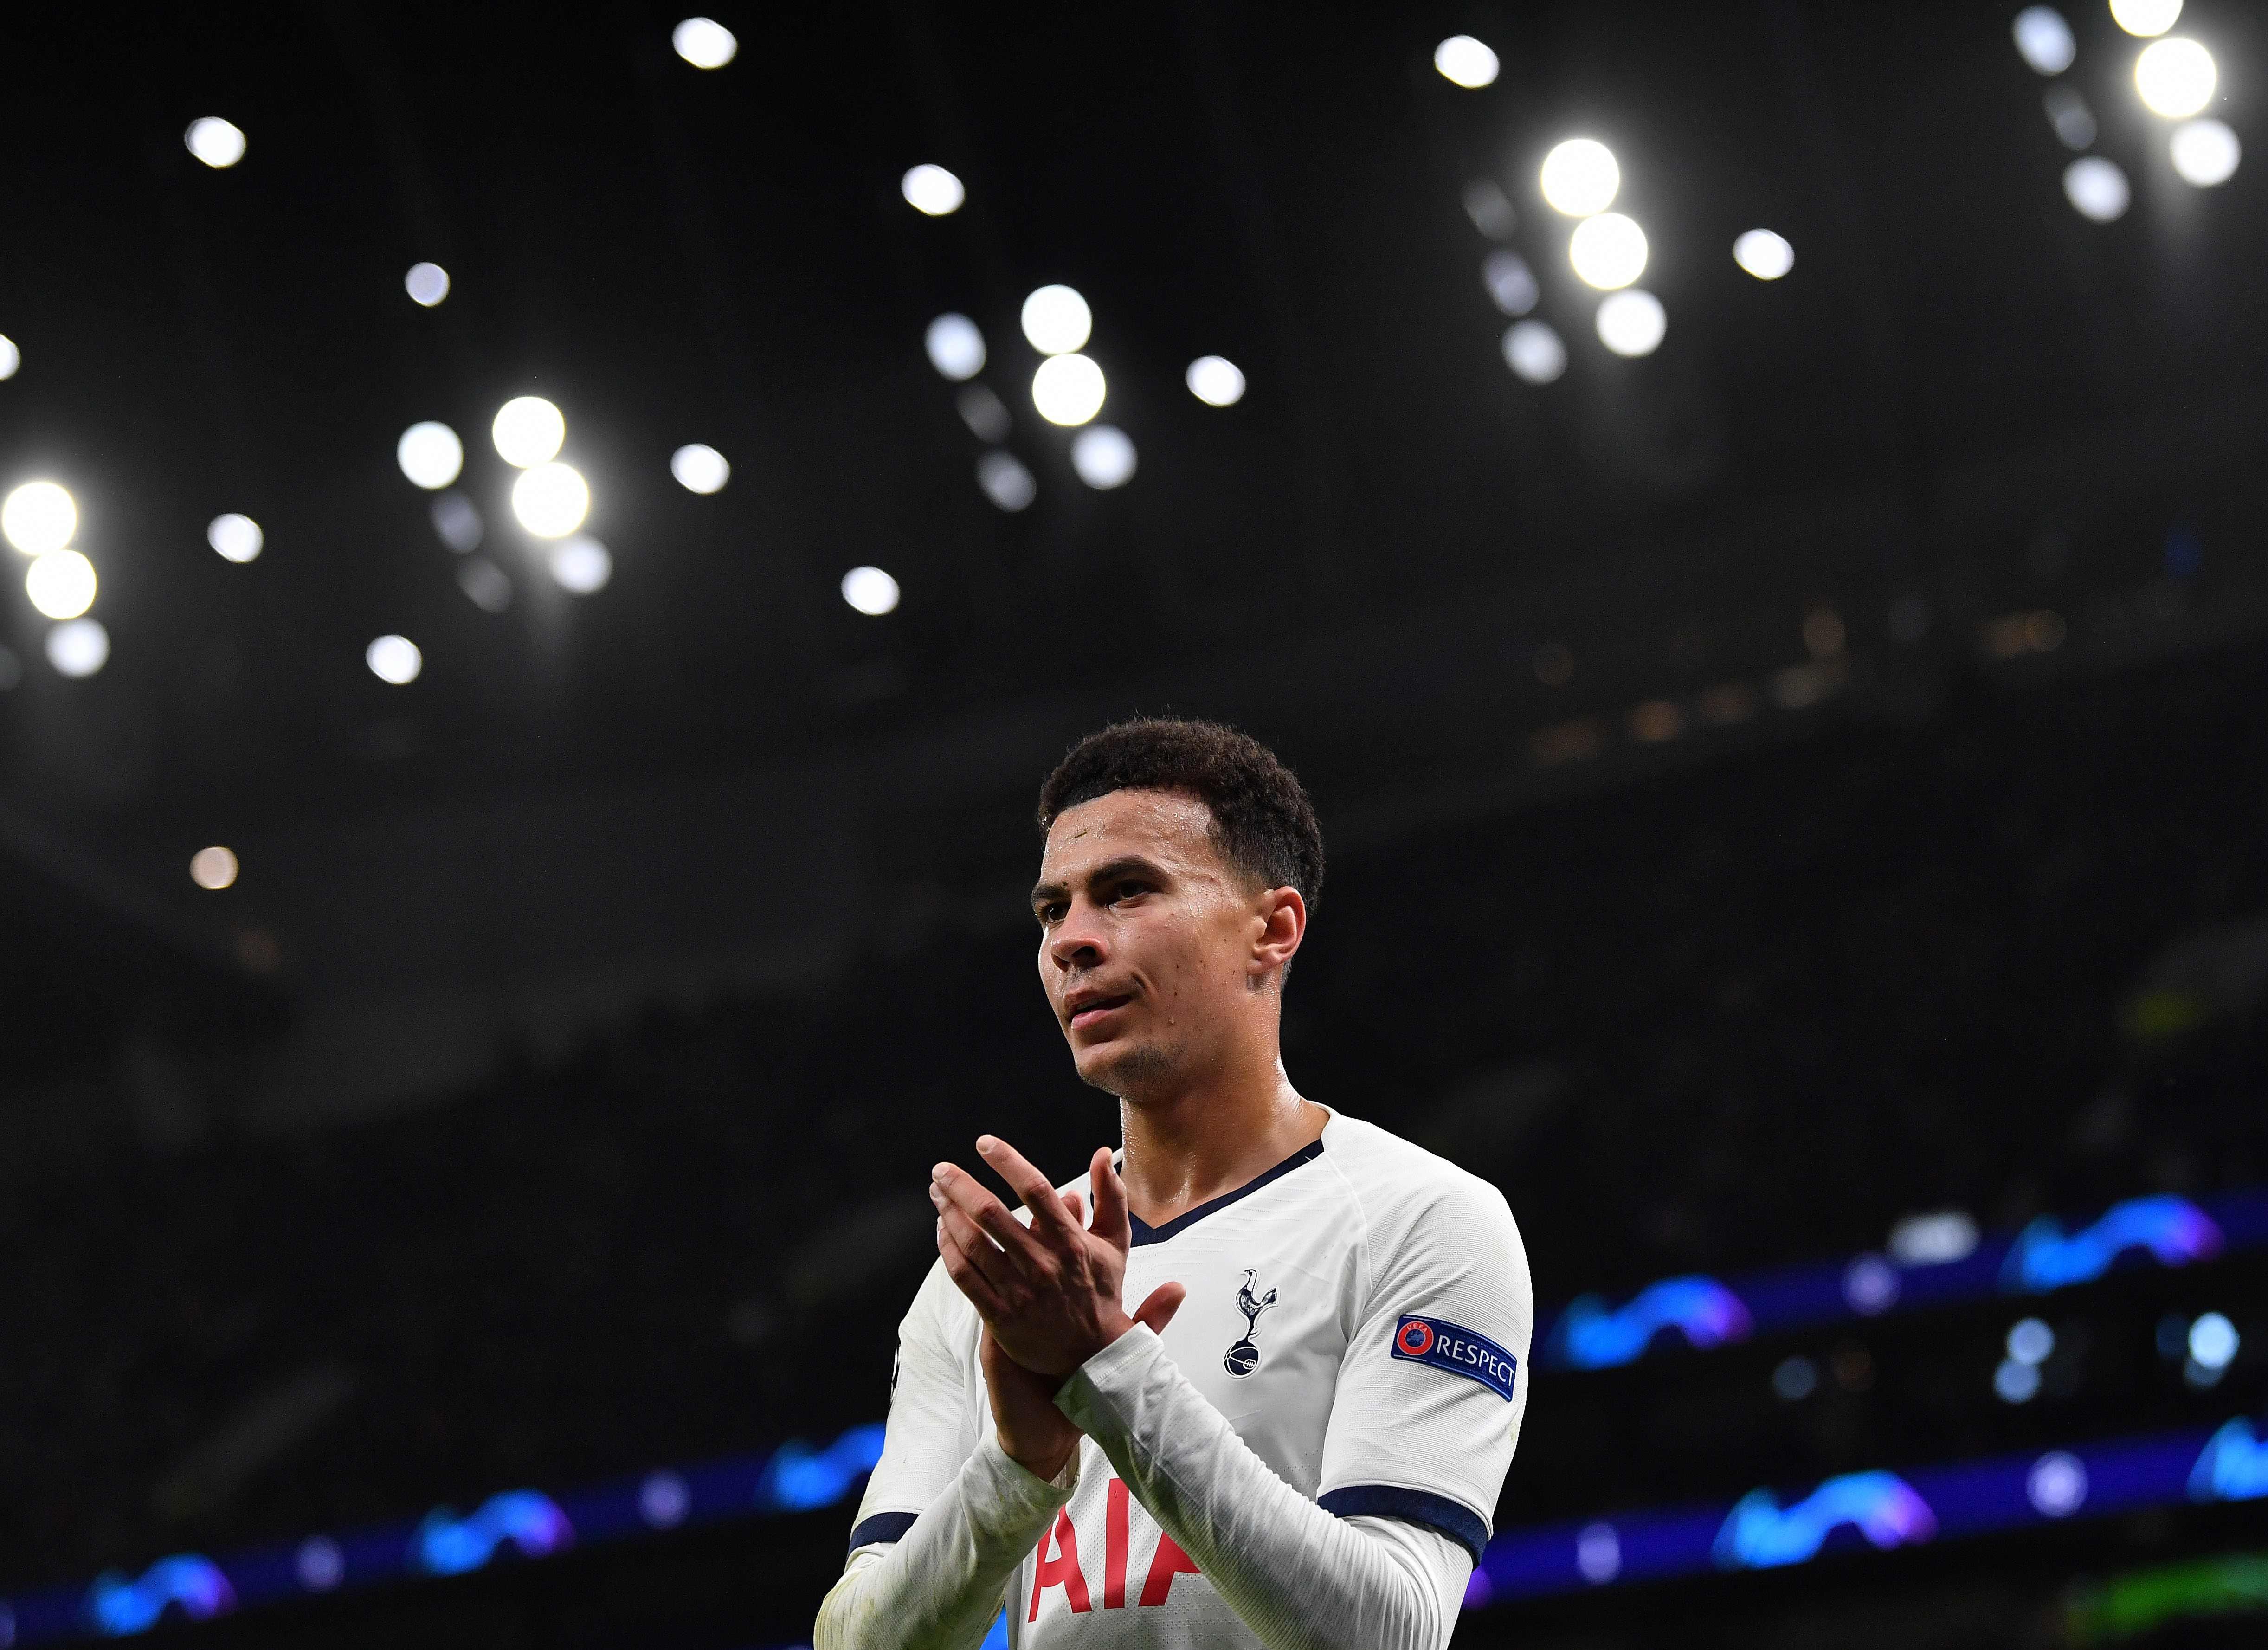 Tottenham's Dele Alli to miss Premier League restart clash against Manchester United after receiving ban for s thumbnail